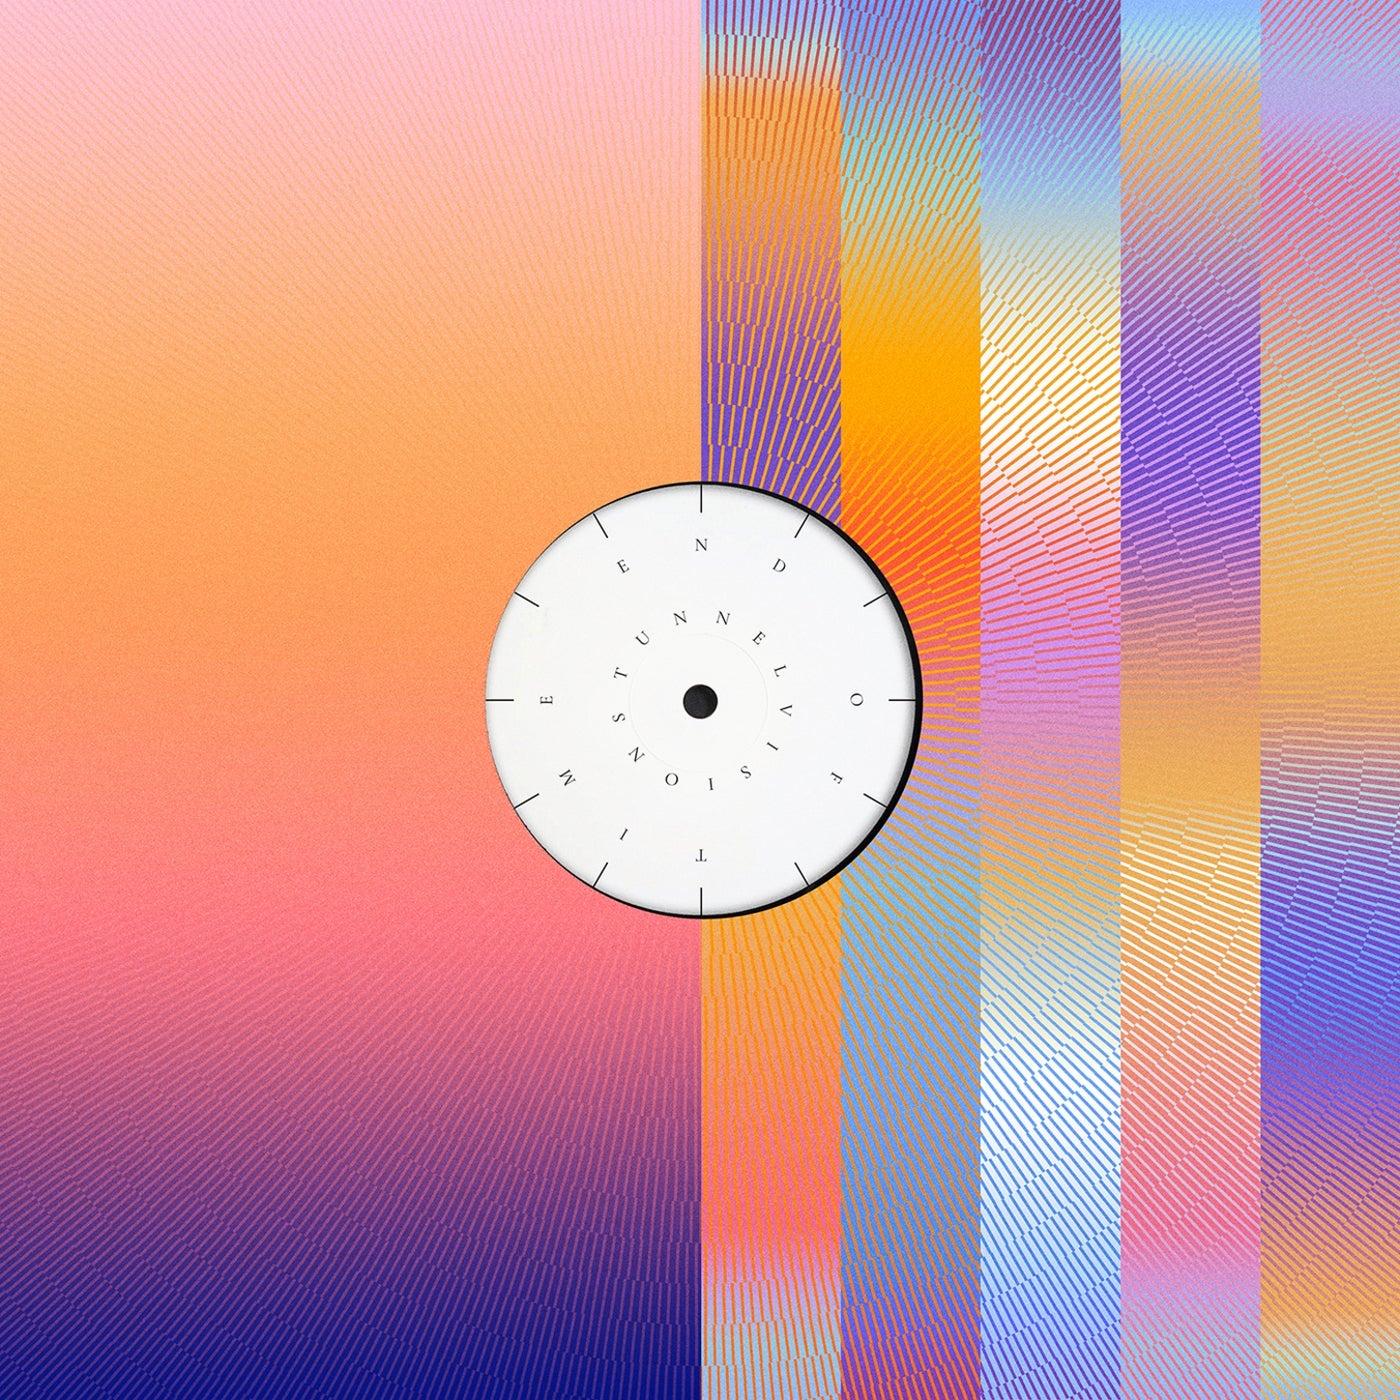 Acid Neverland (Original Mix)